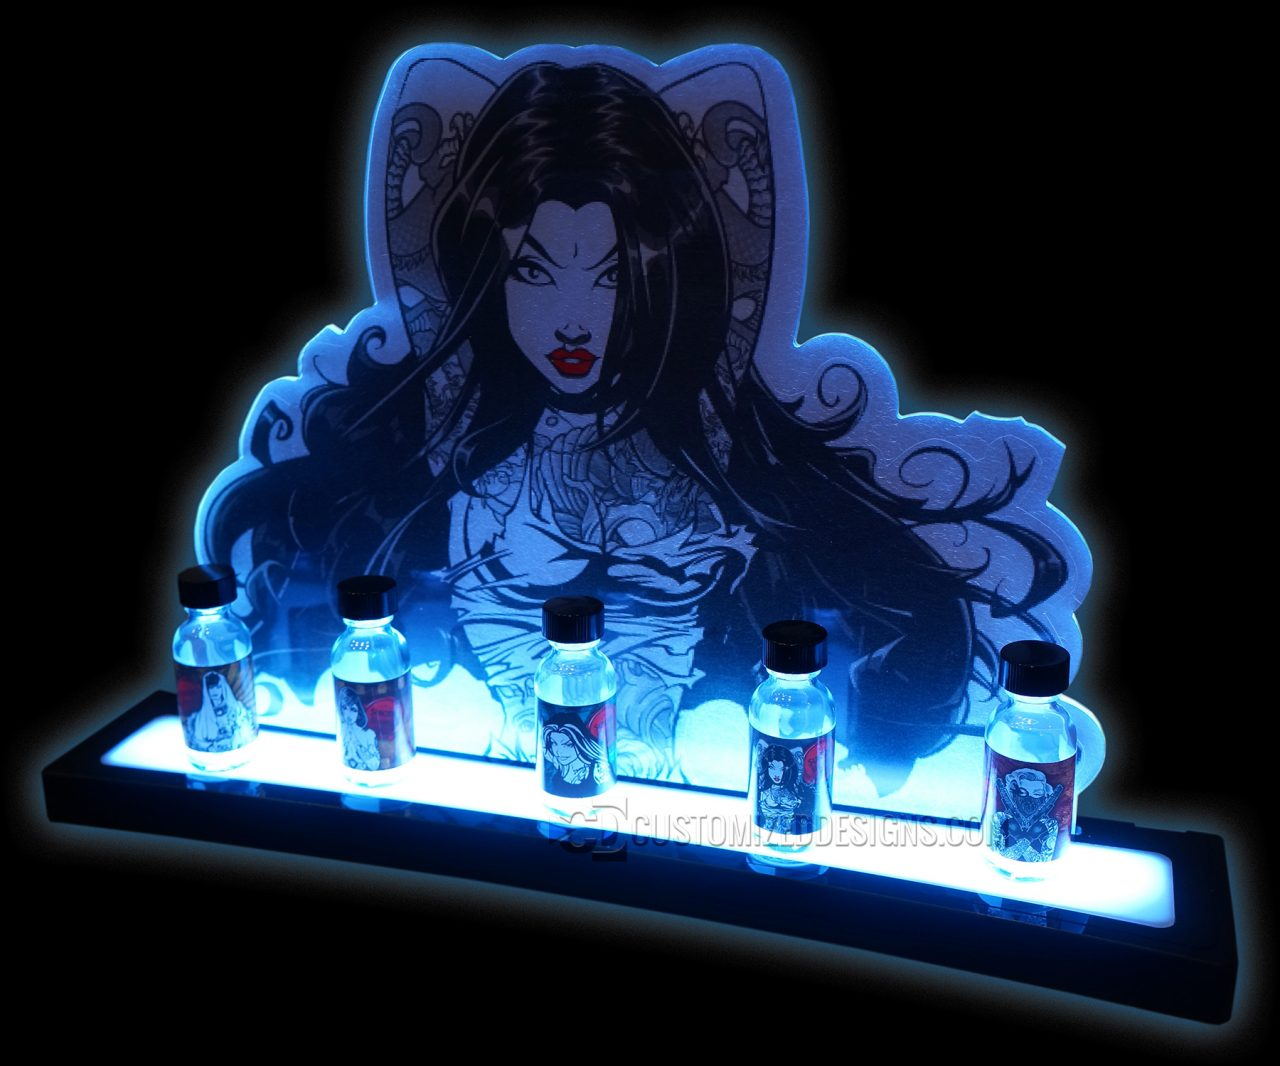 Suicide Bunny Vape Bottle Display